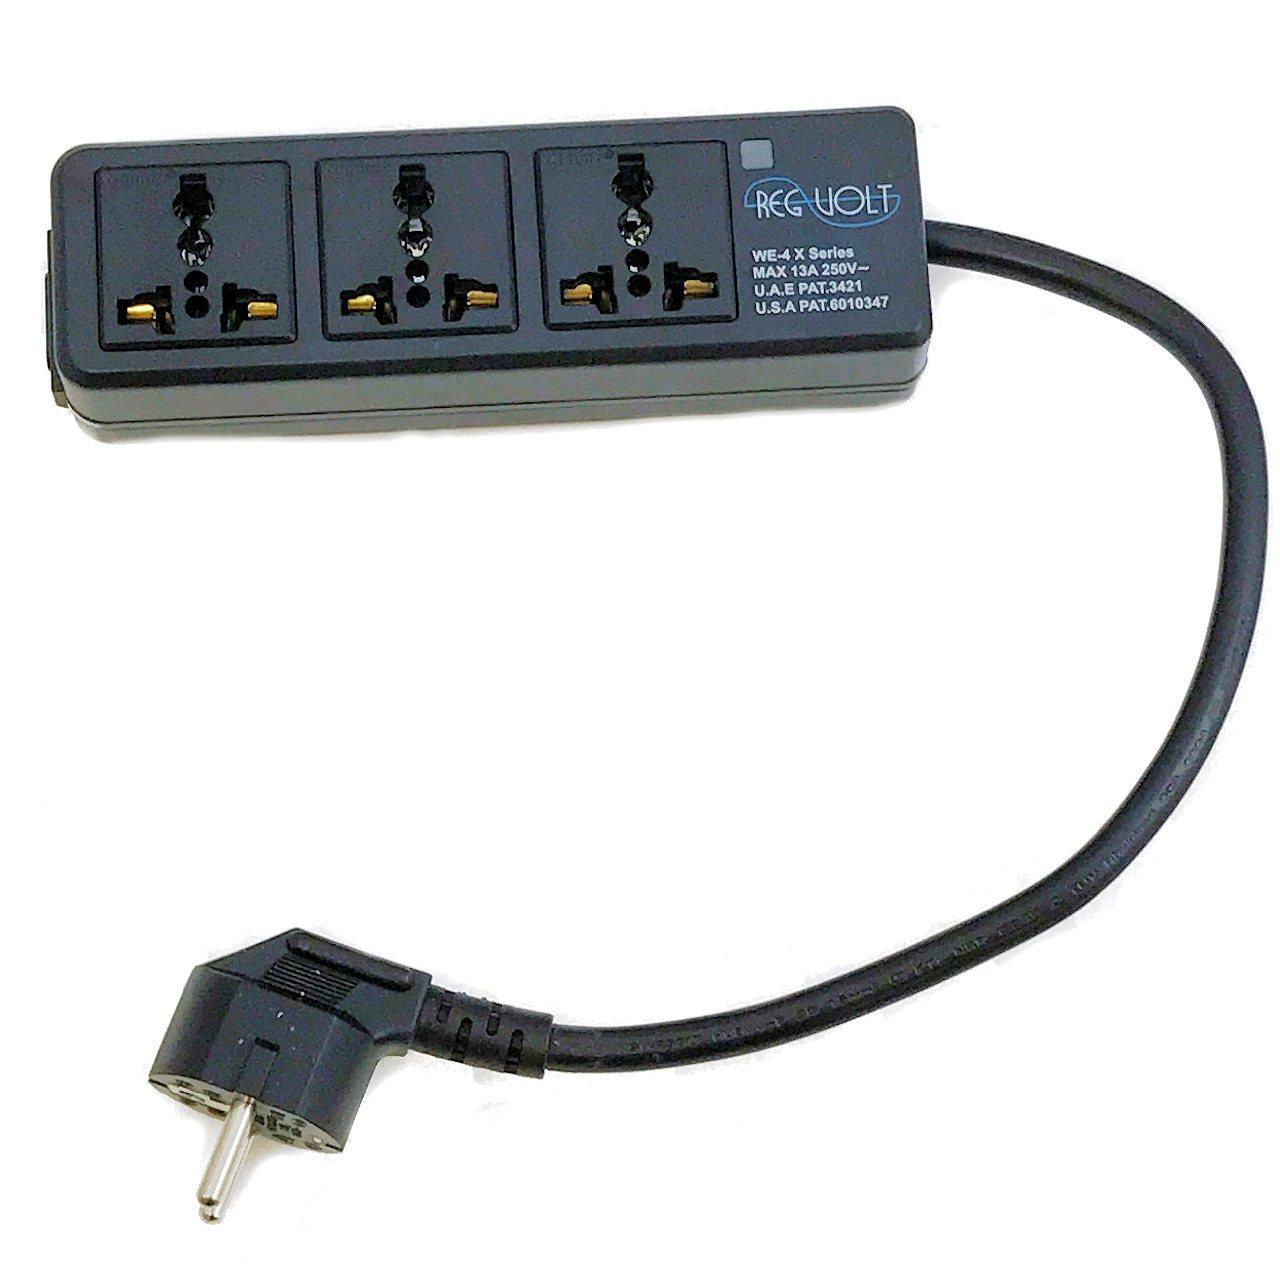 220V Power Strip, Plug Adapter, Shop 220 Volt European ...